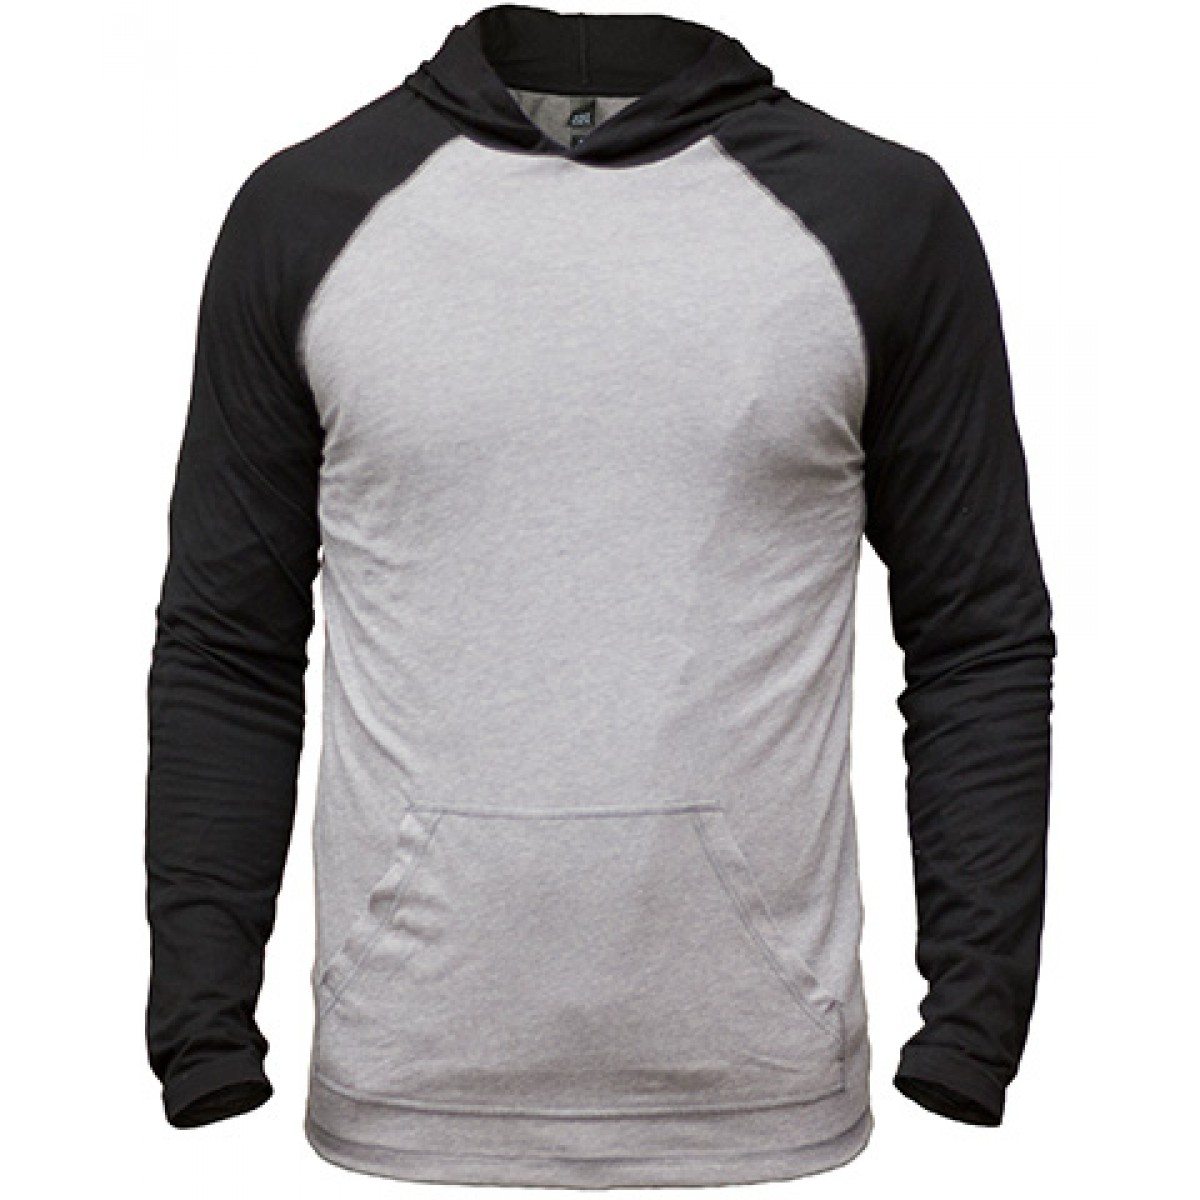 50/50 Raglan Hoodie-Gray/Black-3XL